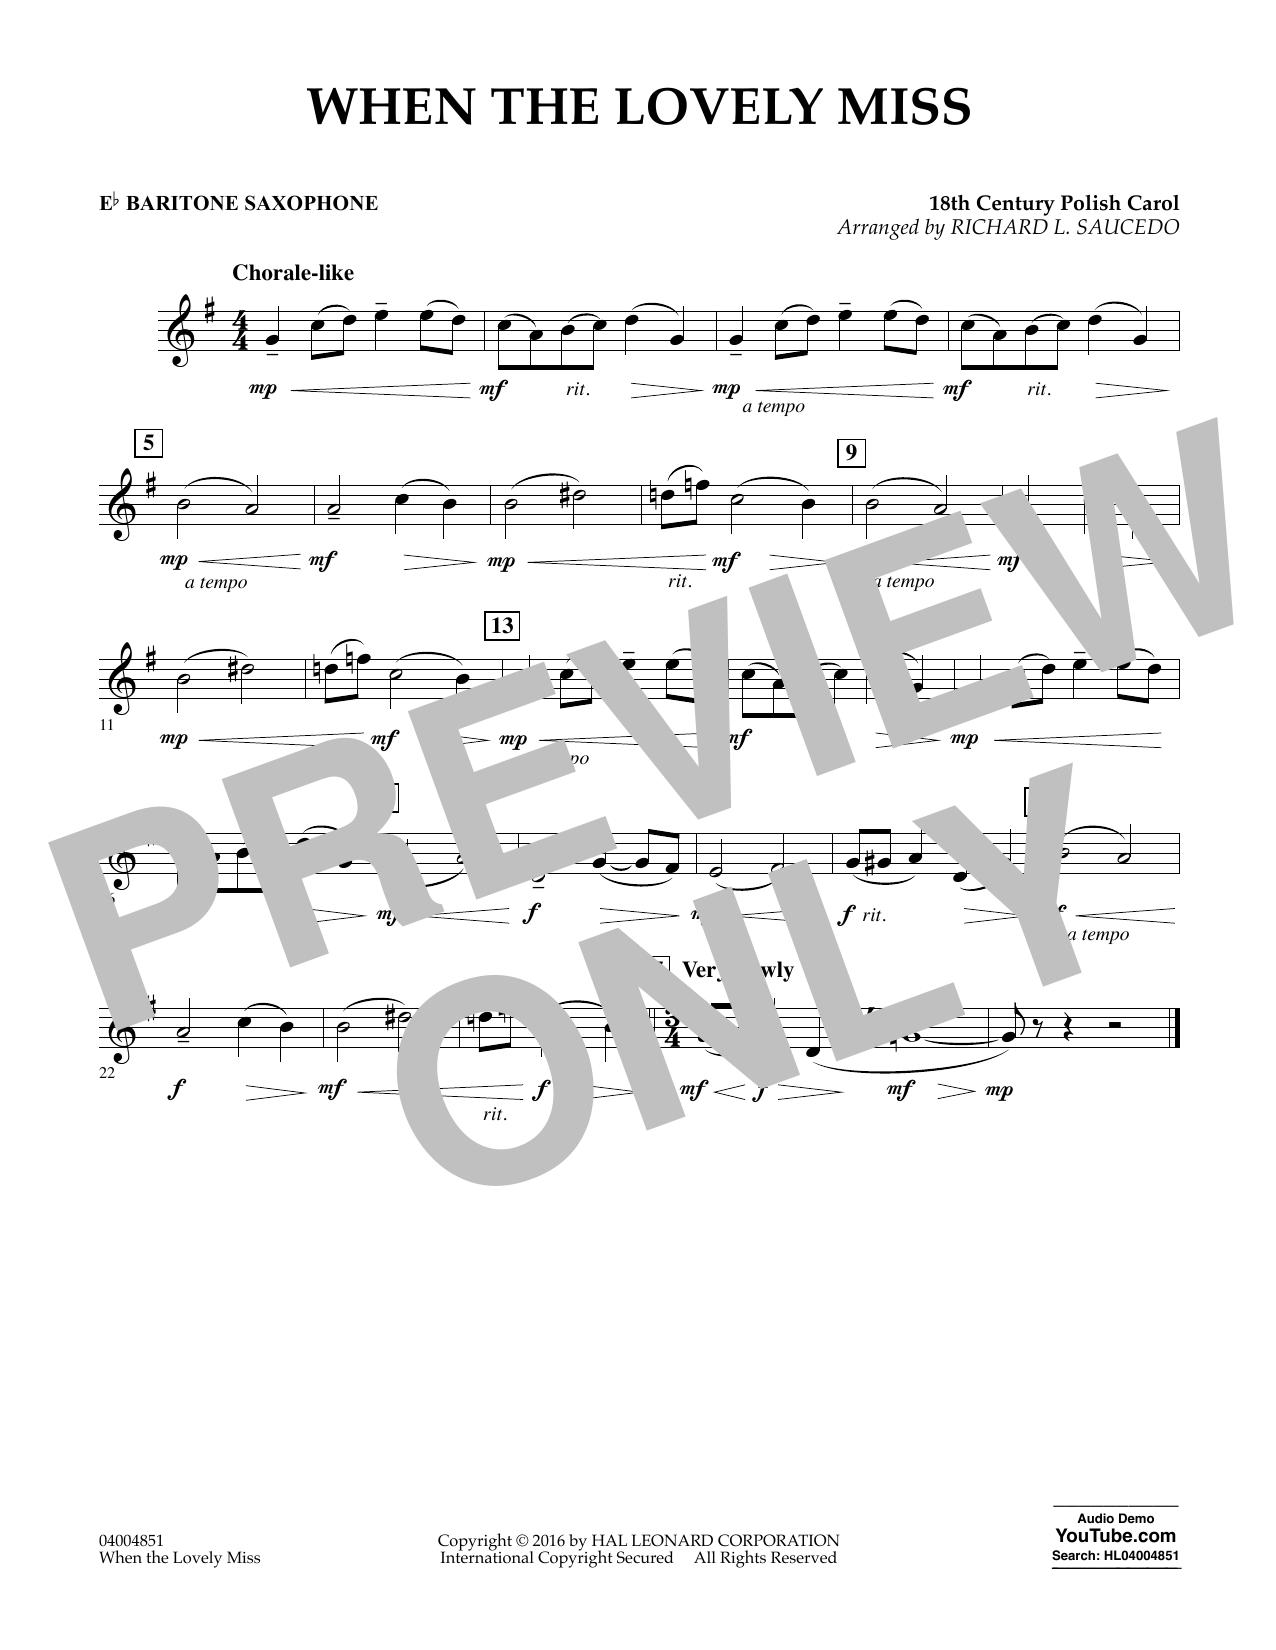 When the Lovely Miss (18th Century Polish Carol) - Eb Baritone Saxophone (Concert Band)